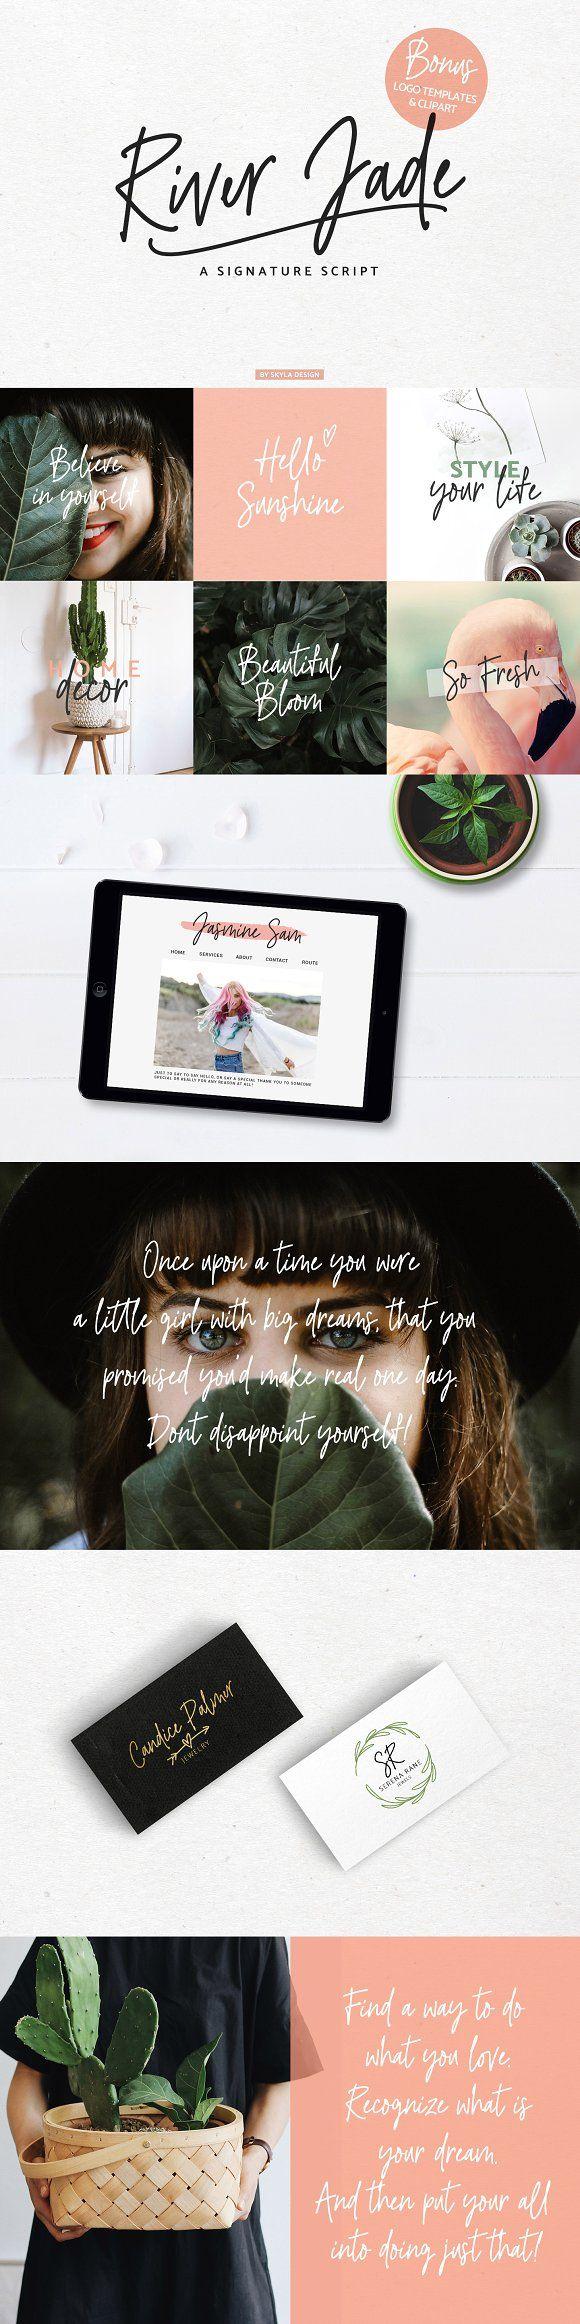 River Jade, Signature Font & Logos by Skyla Design on @creativemarket